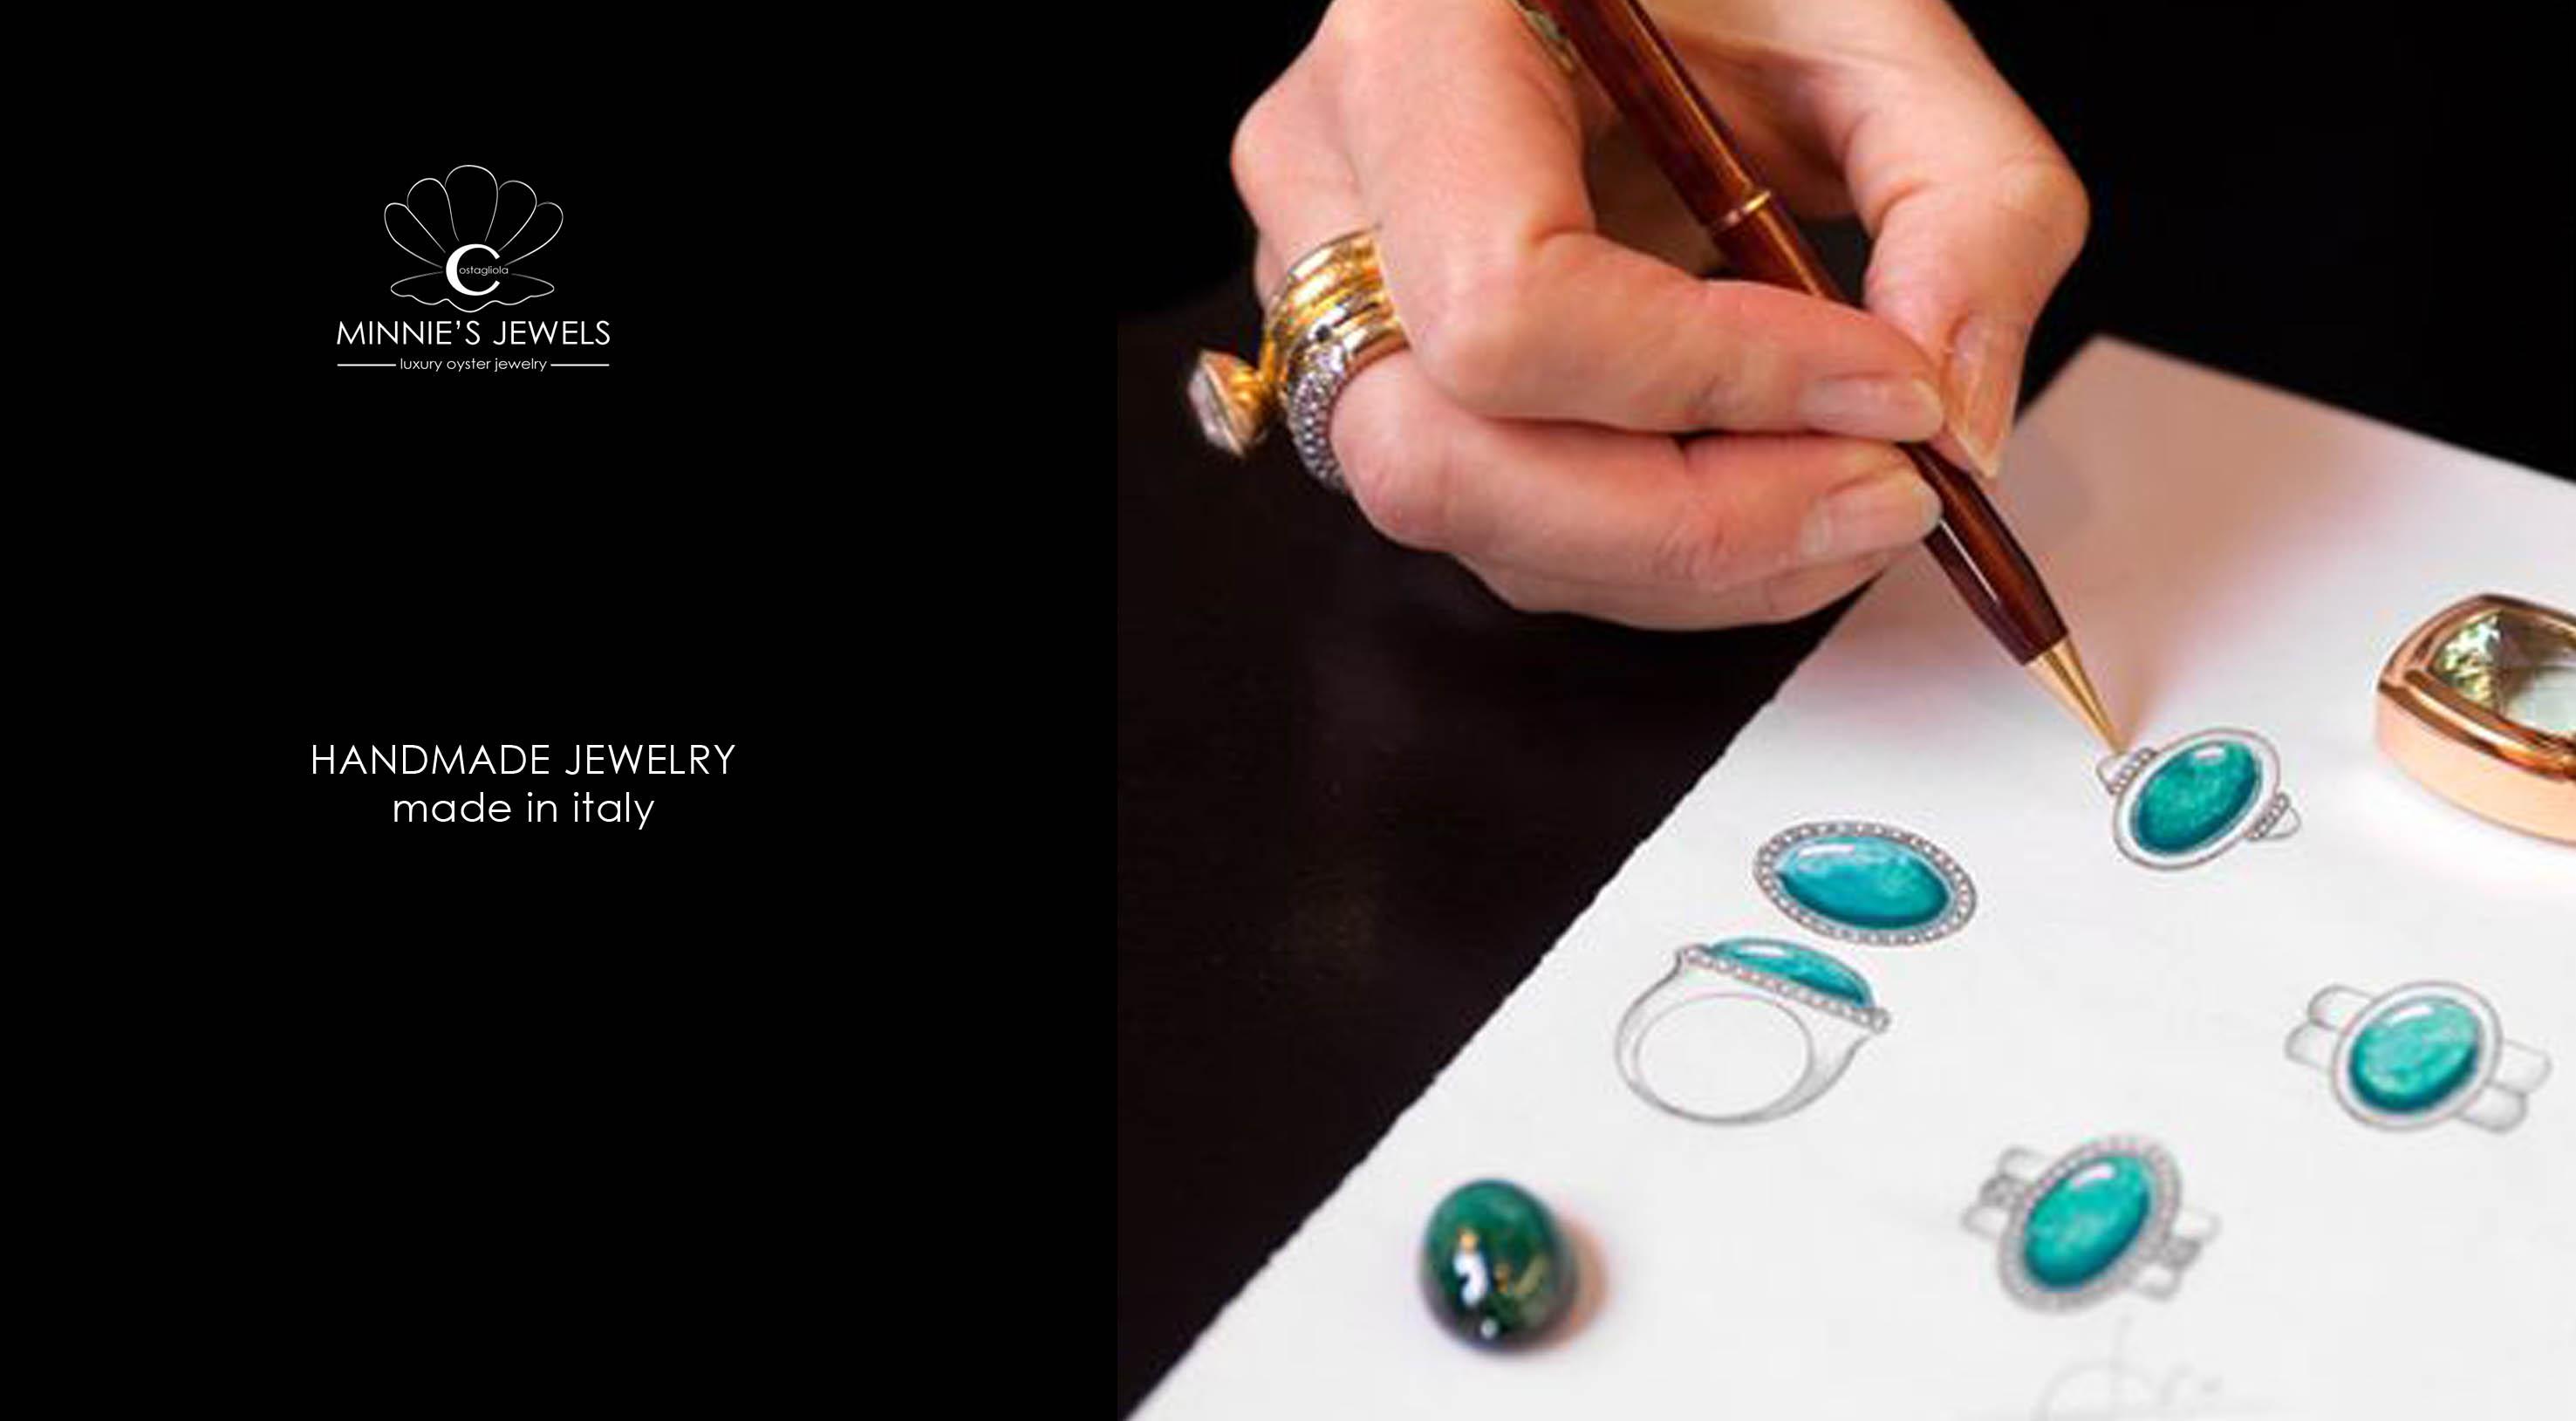 minniesjewels - Handmade Jewelry - made in Italy